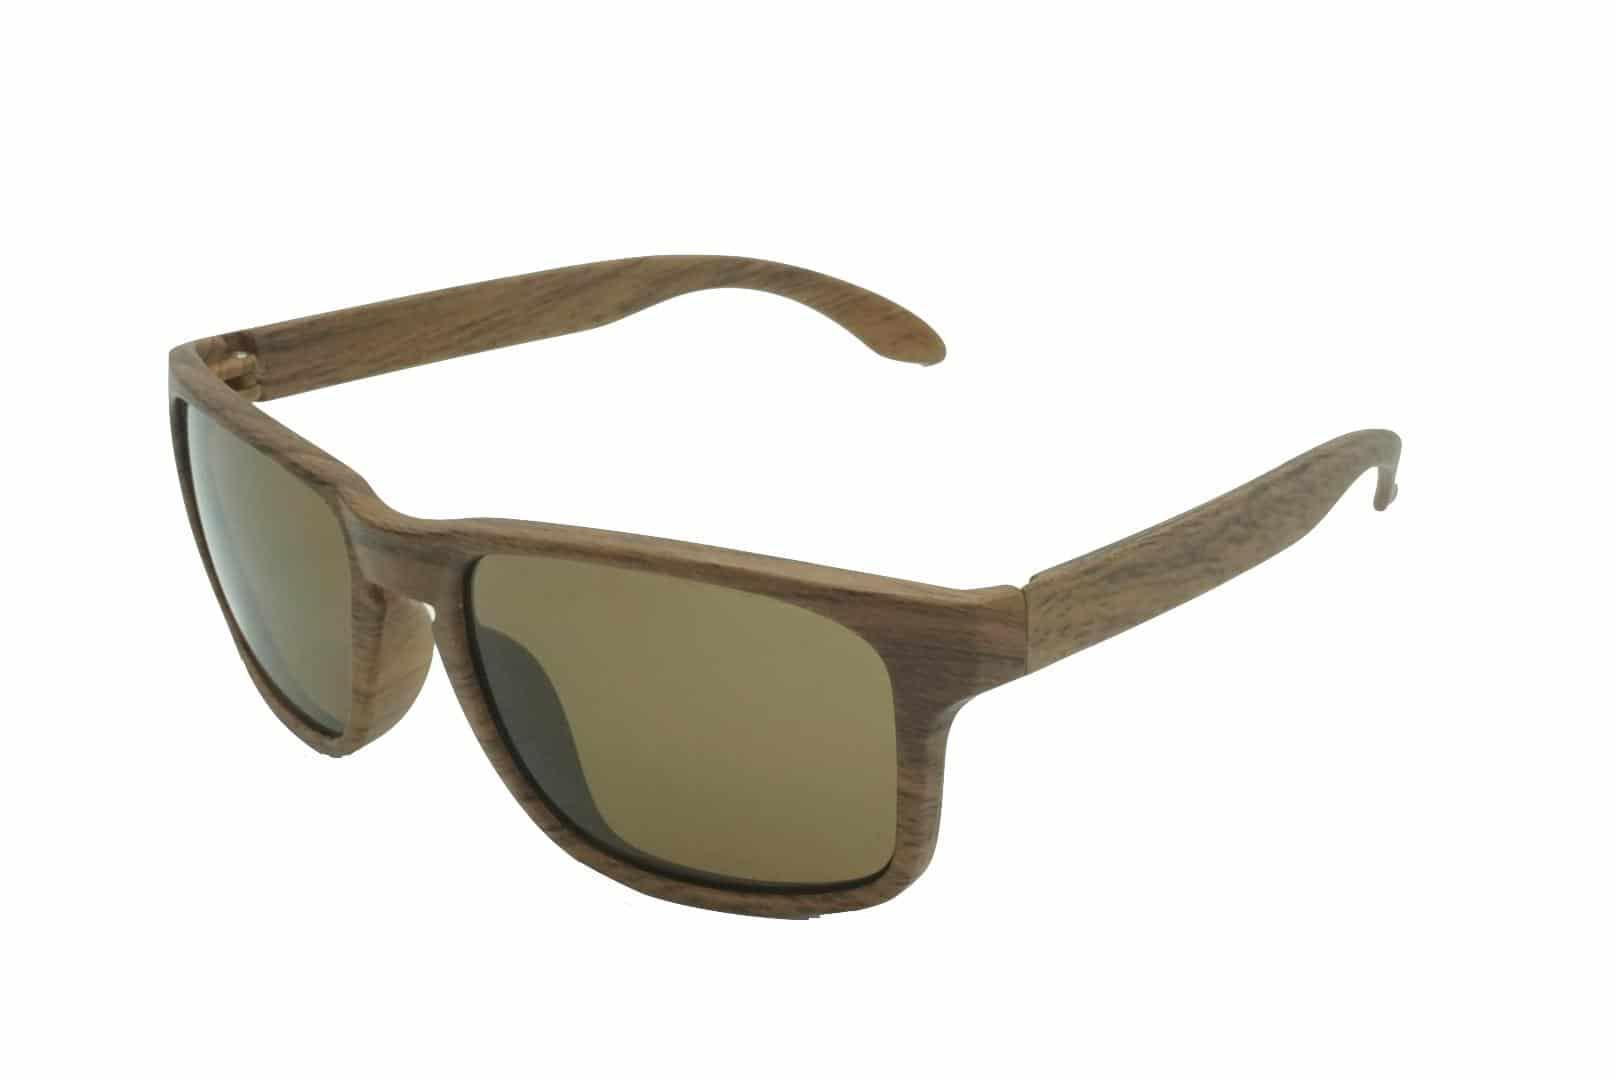 4Goodz Nice brown - houtlook wayfarer zonnebril - Bruin - Uv400